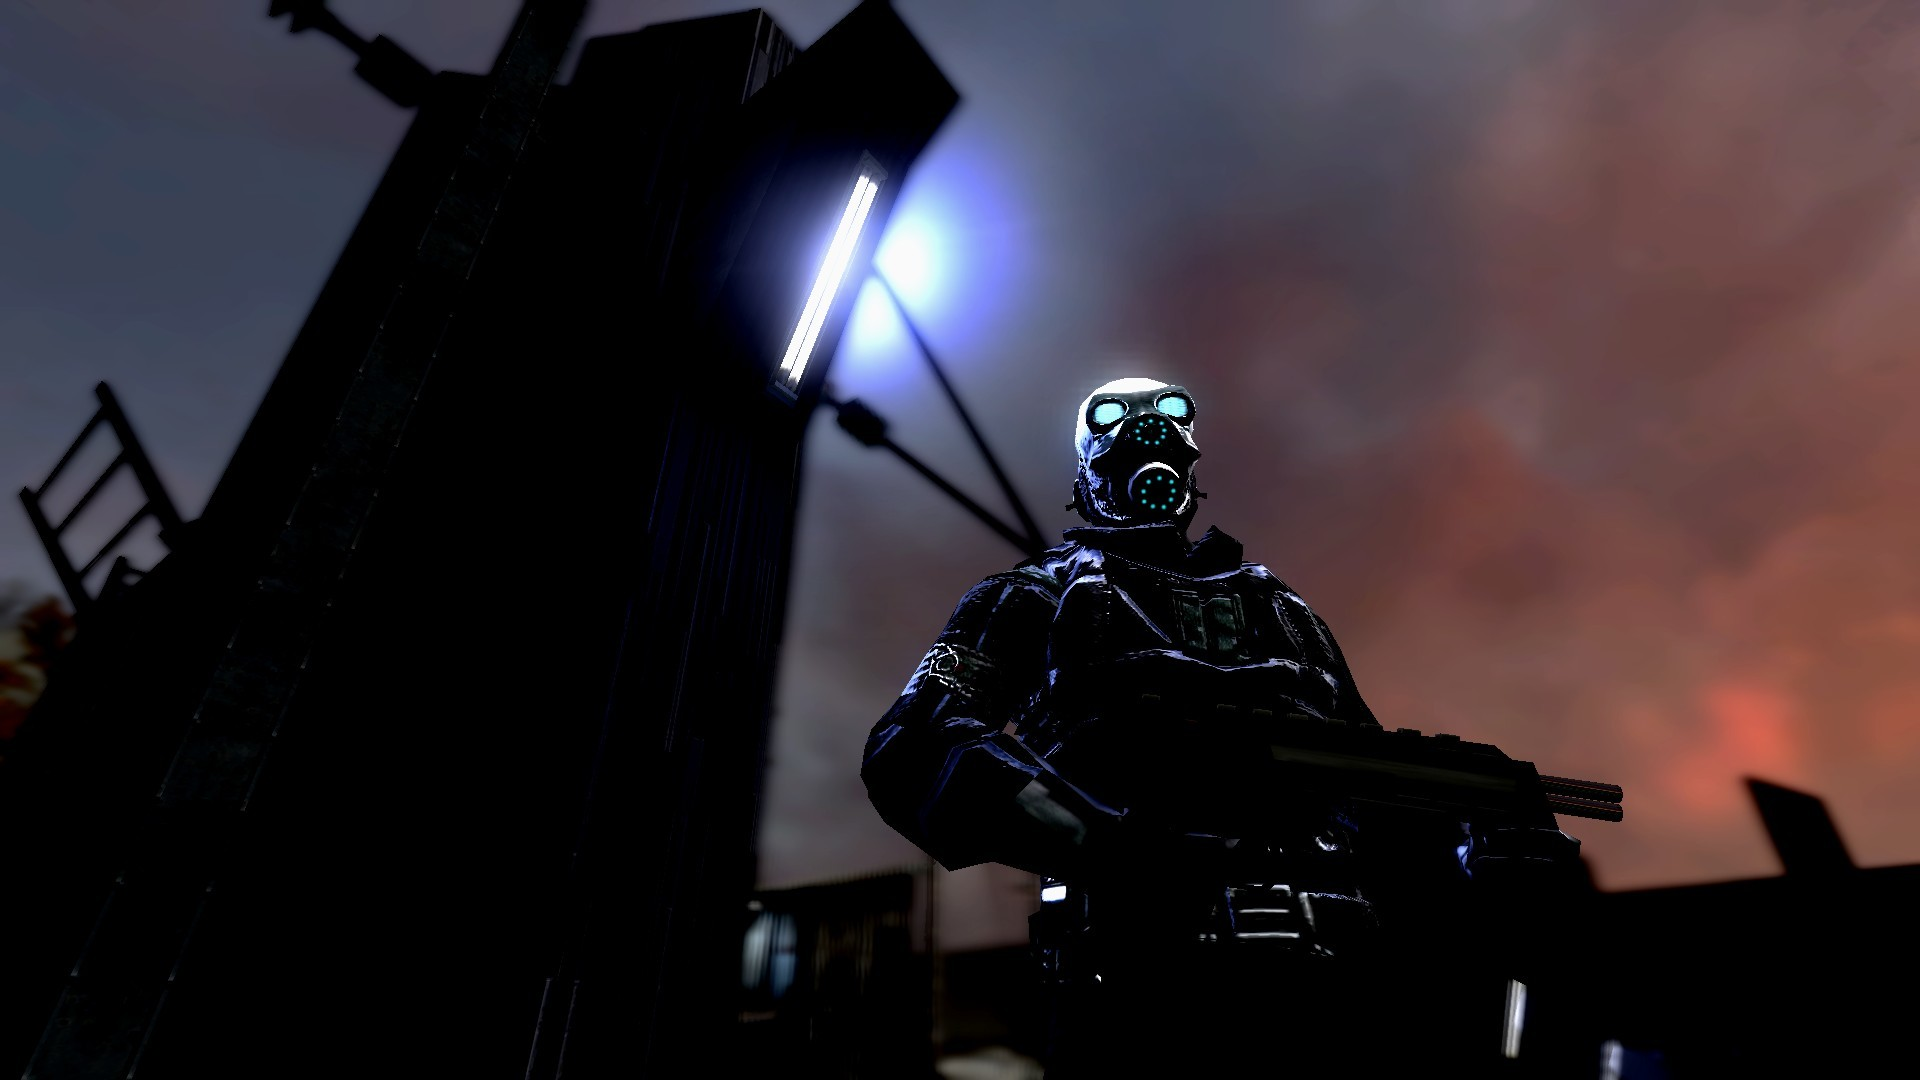 Valve corporation half-life garrys mod wallpaper